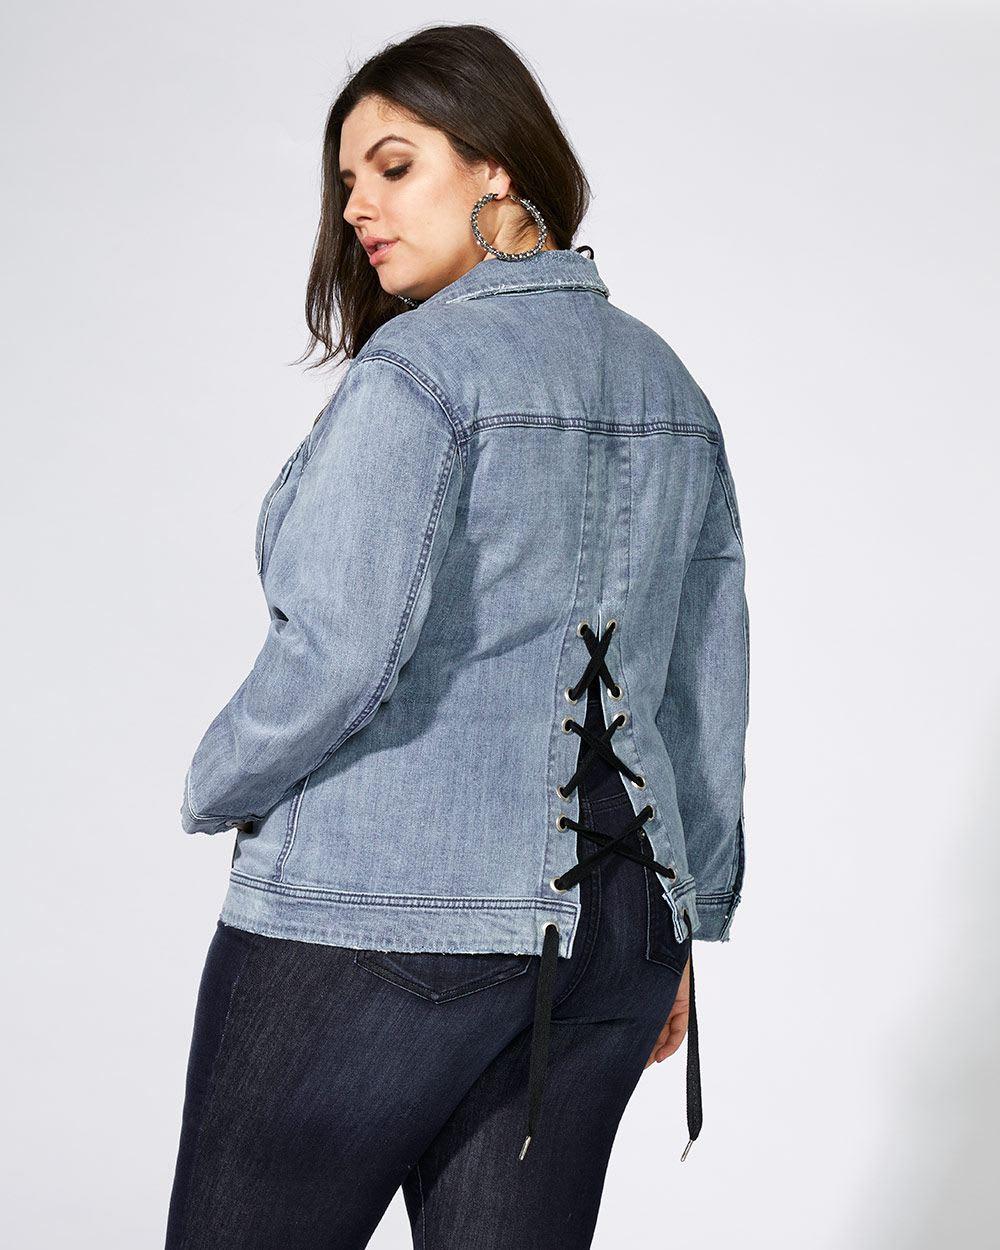 Denim Jacket with Lace-Up Back - mblm